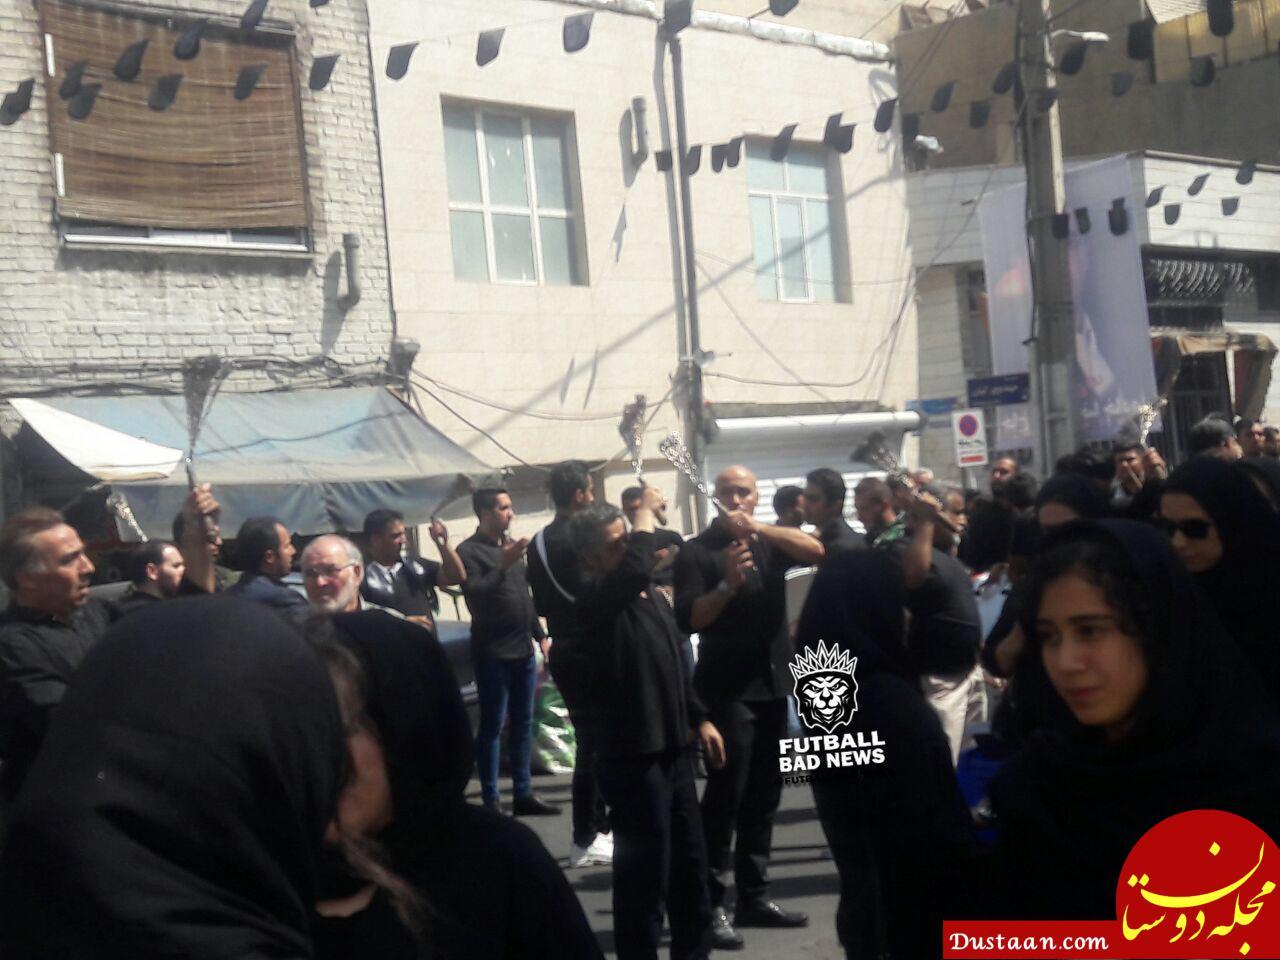 www.dustaan.com سرمربی سابق استقلال در حال زنجیر زنی +عکس